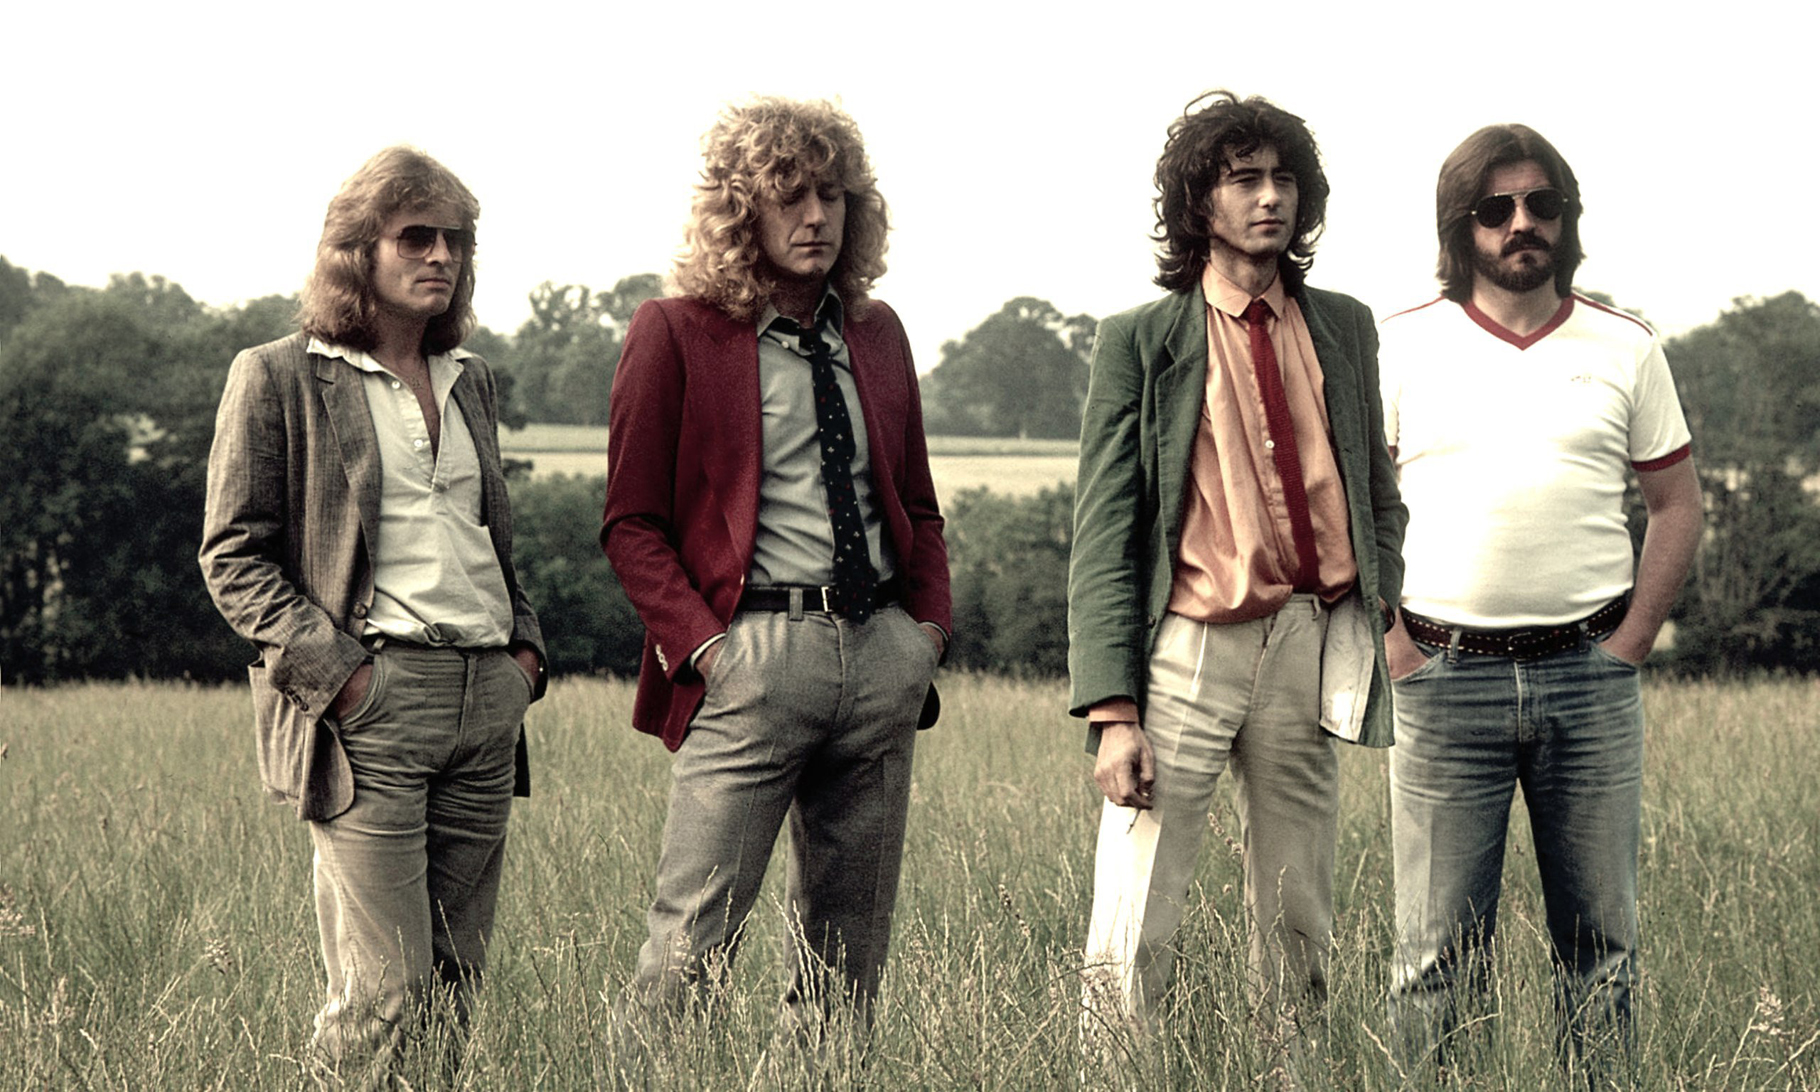 Led_Zeppelin_1979_photo_1